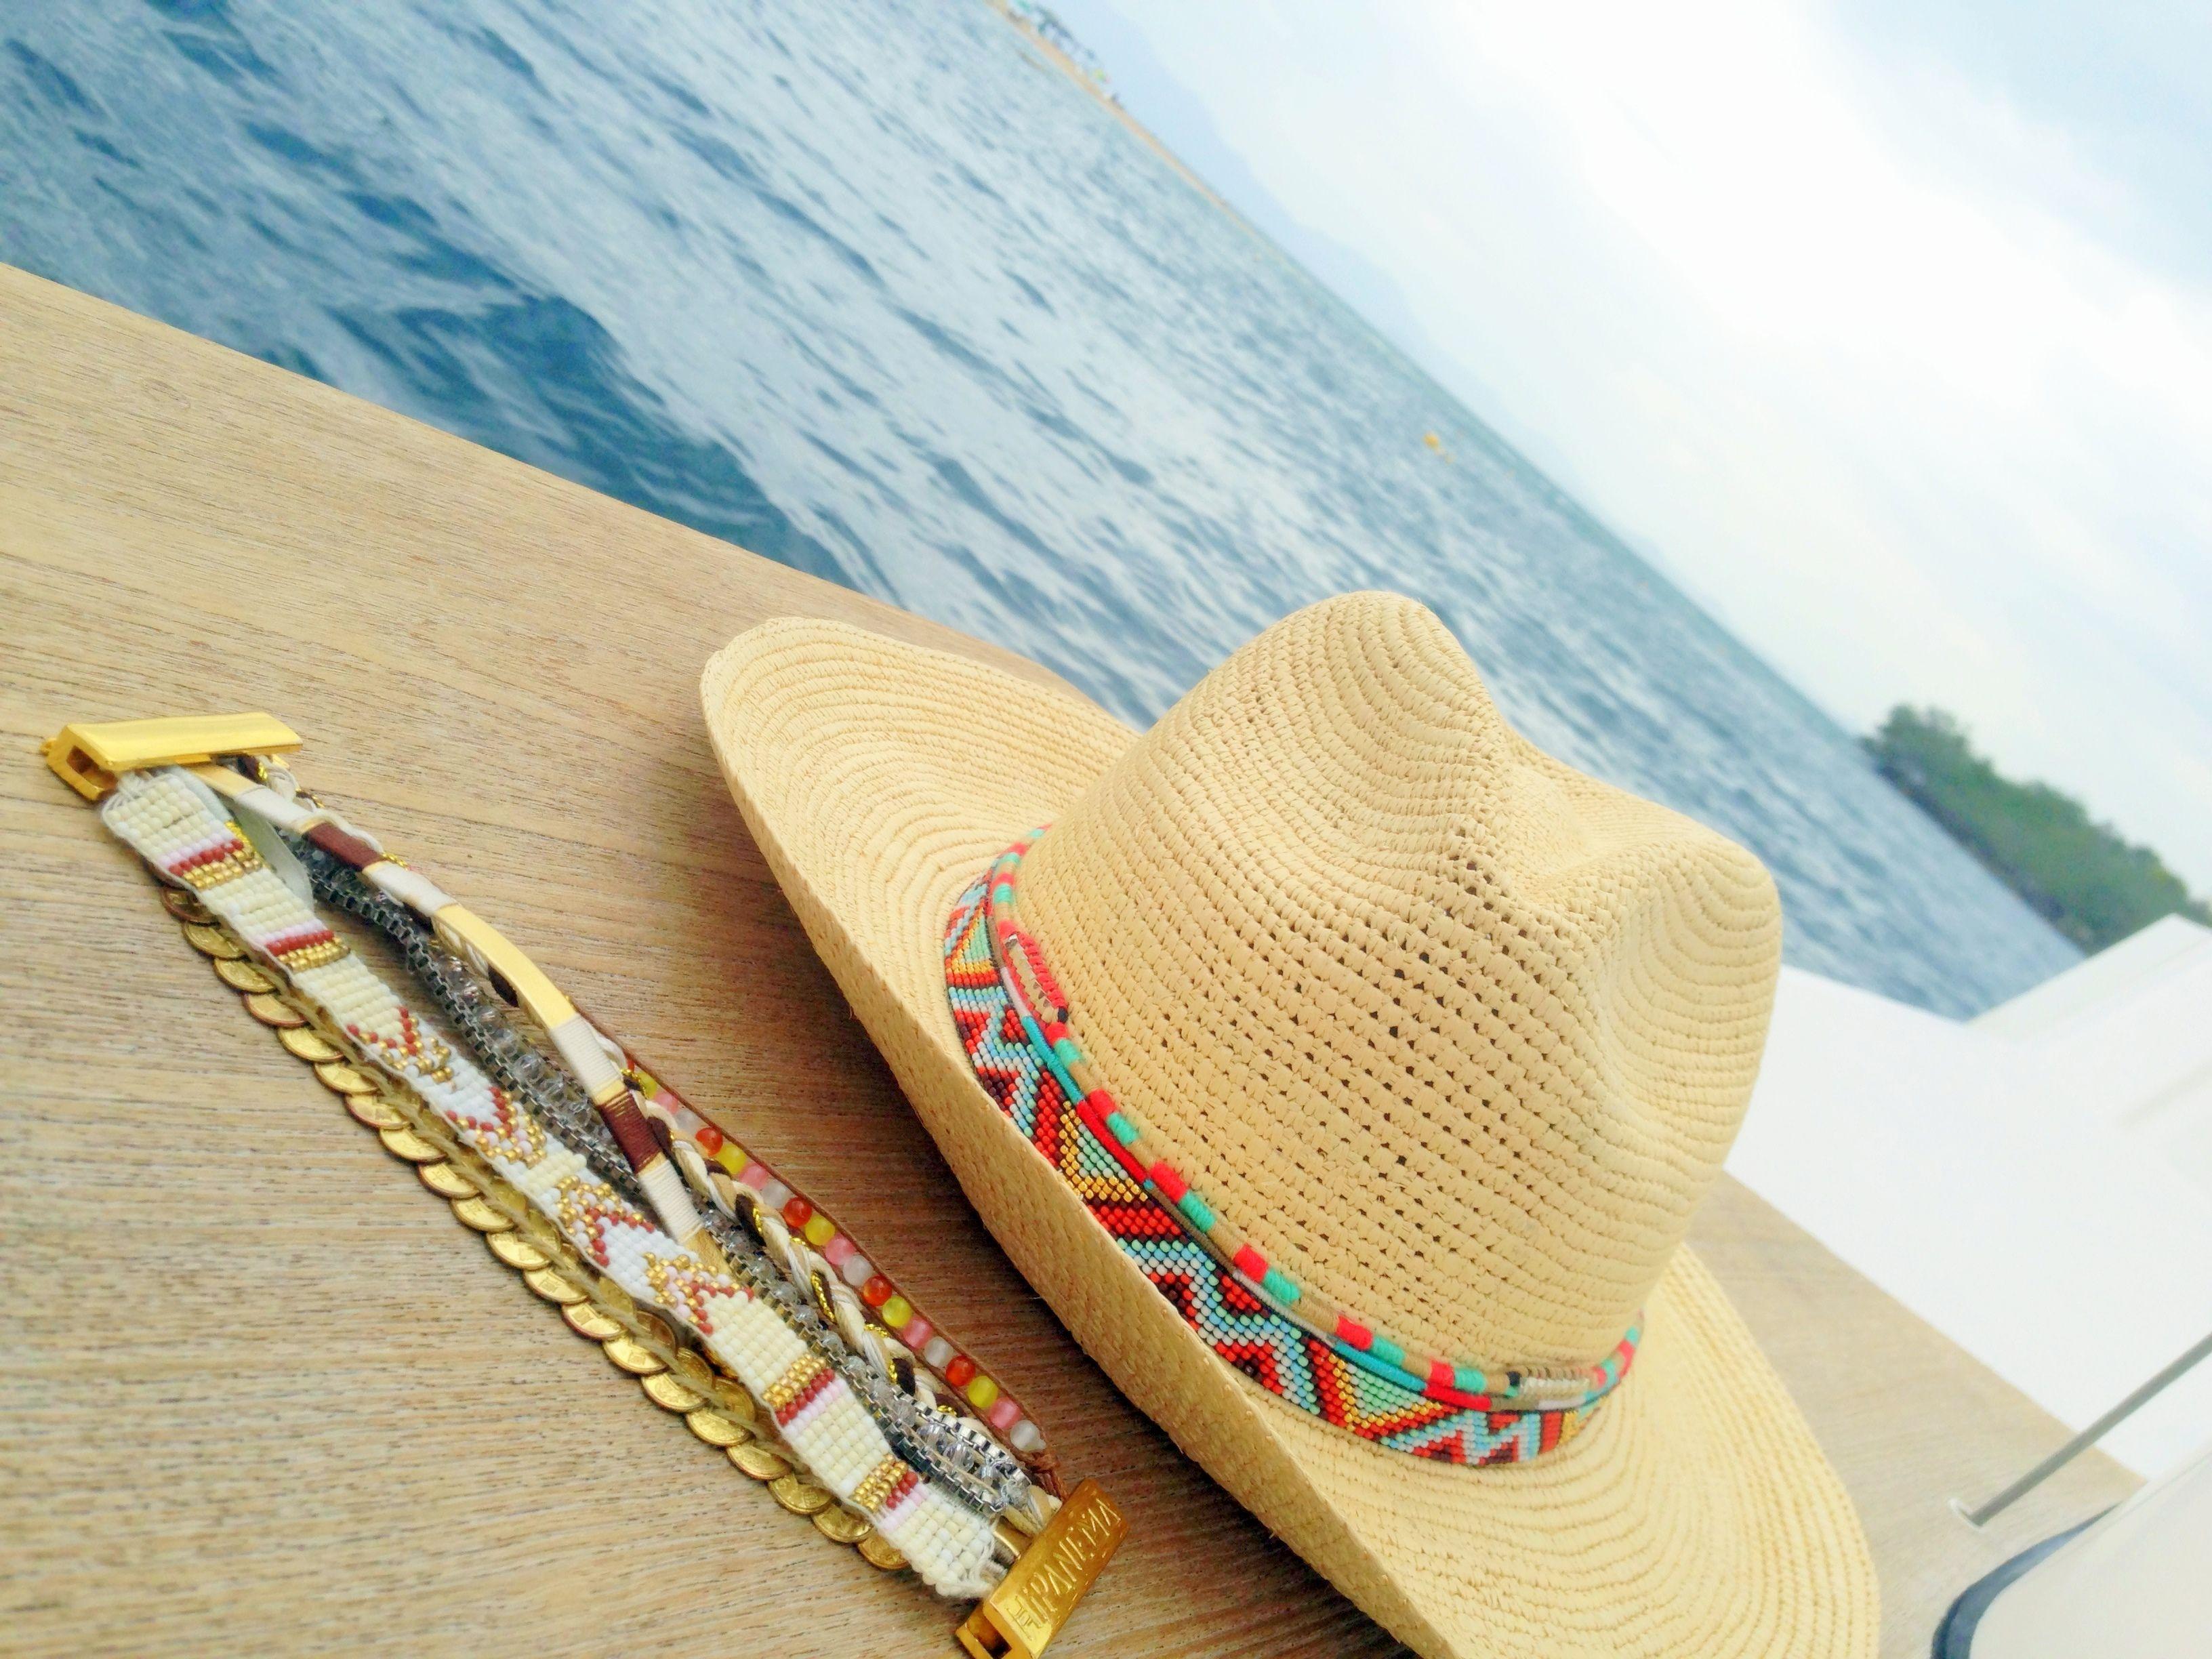 007579bb20d24 Panama Hat + bracelet by Hipanema - at Nueve Musas Musa